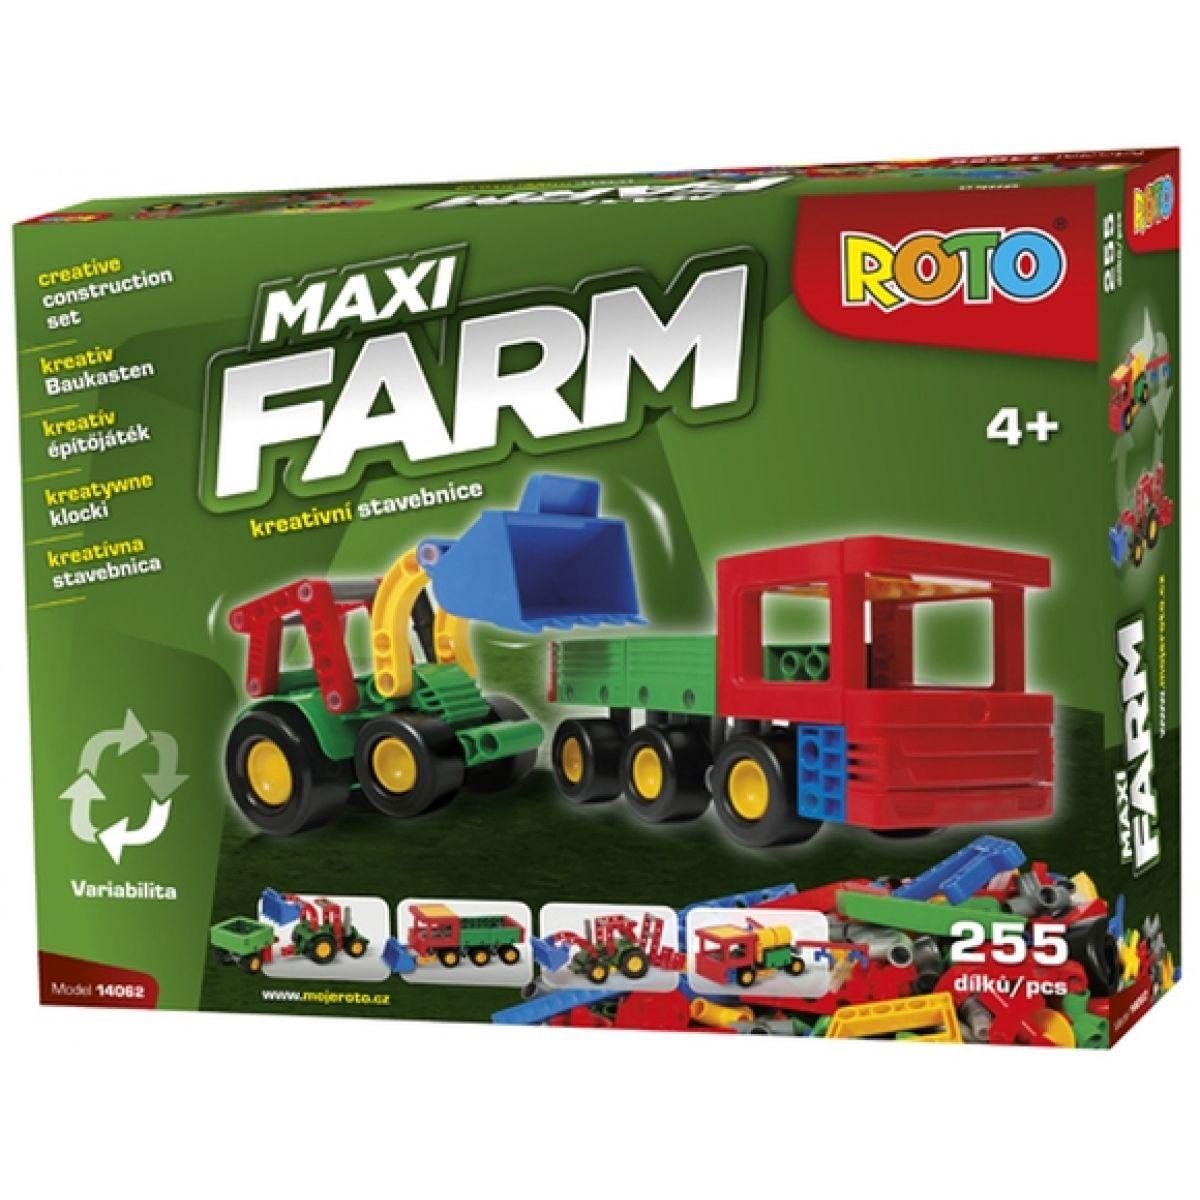 ROTO - Stavebnice Maxi FARM 14062